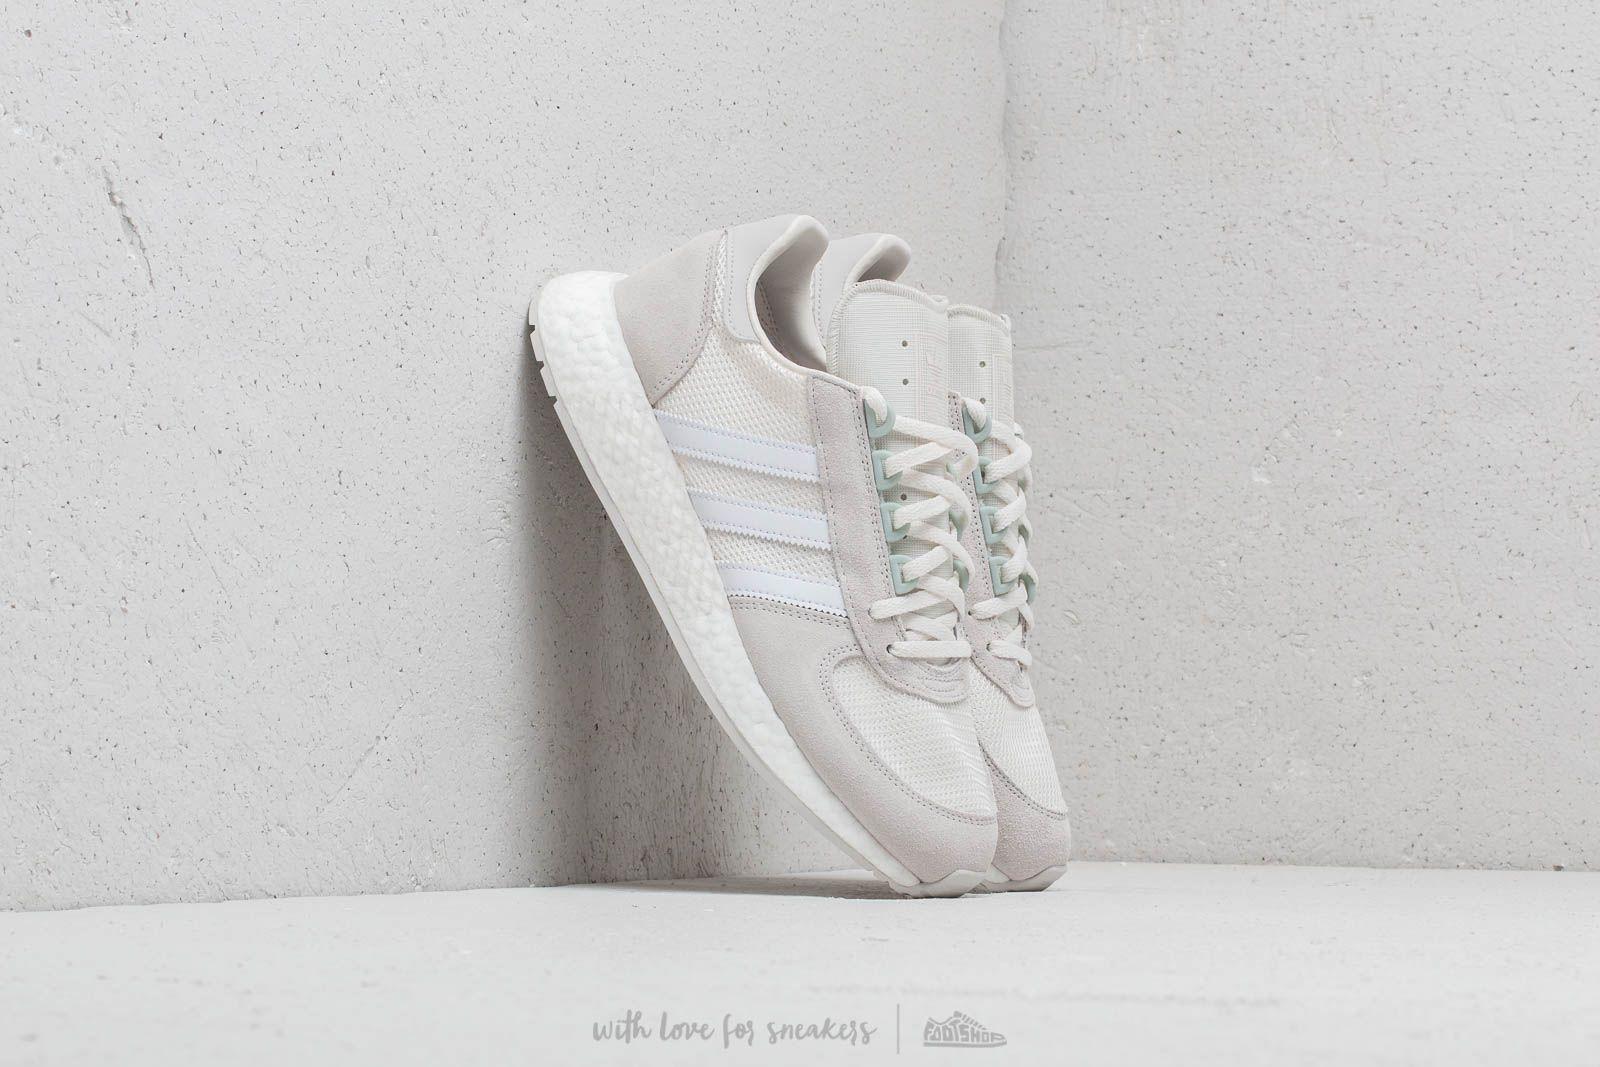 98c78b1850 adidas Marathon x 5923 Cloud White/ Footwear White/ Grey One nagyszerű  árakon 43 957